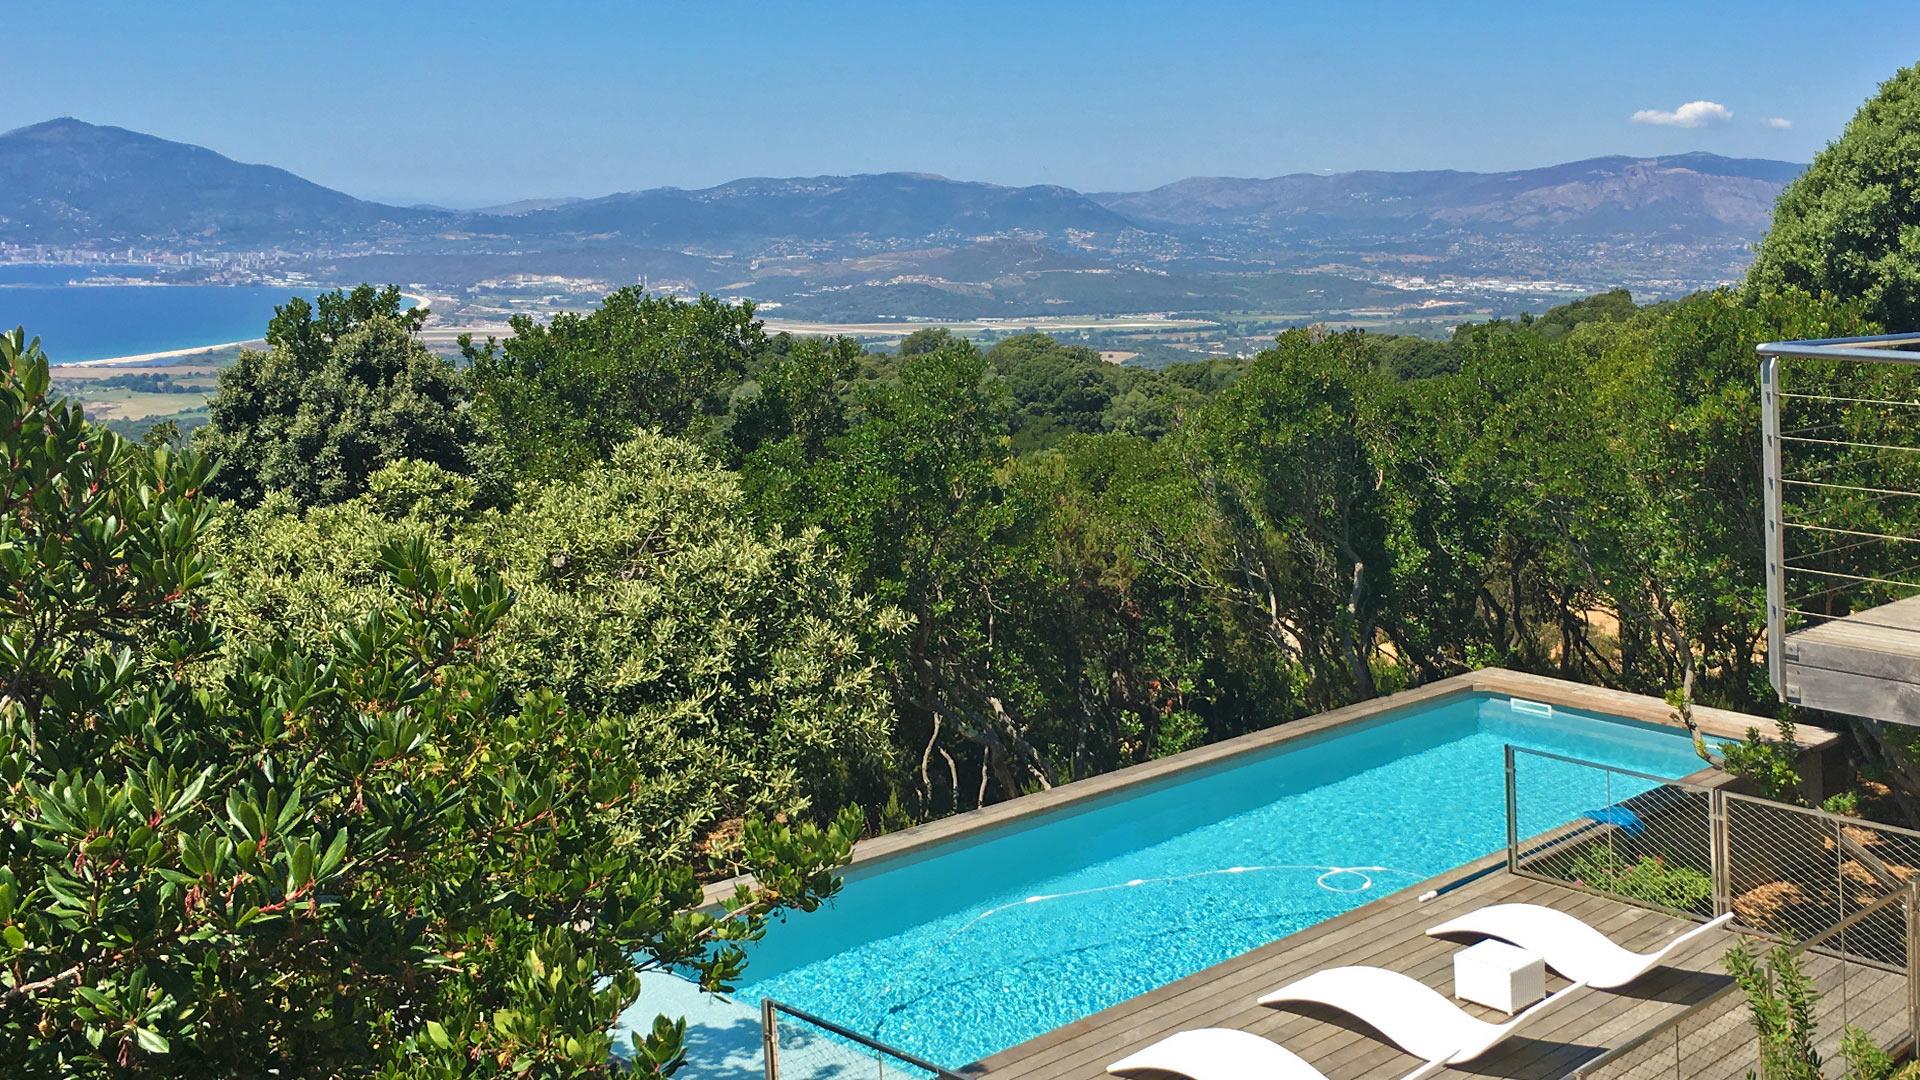 Swimmingpool Villa Villa Orso In Korsika   Swimmingpool